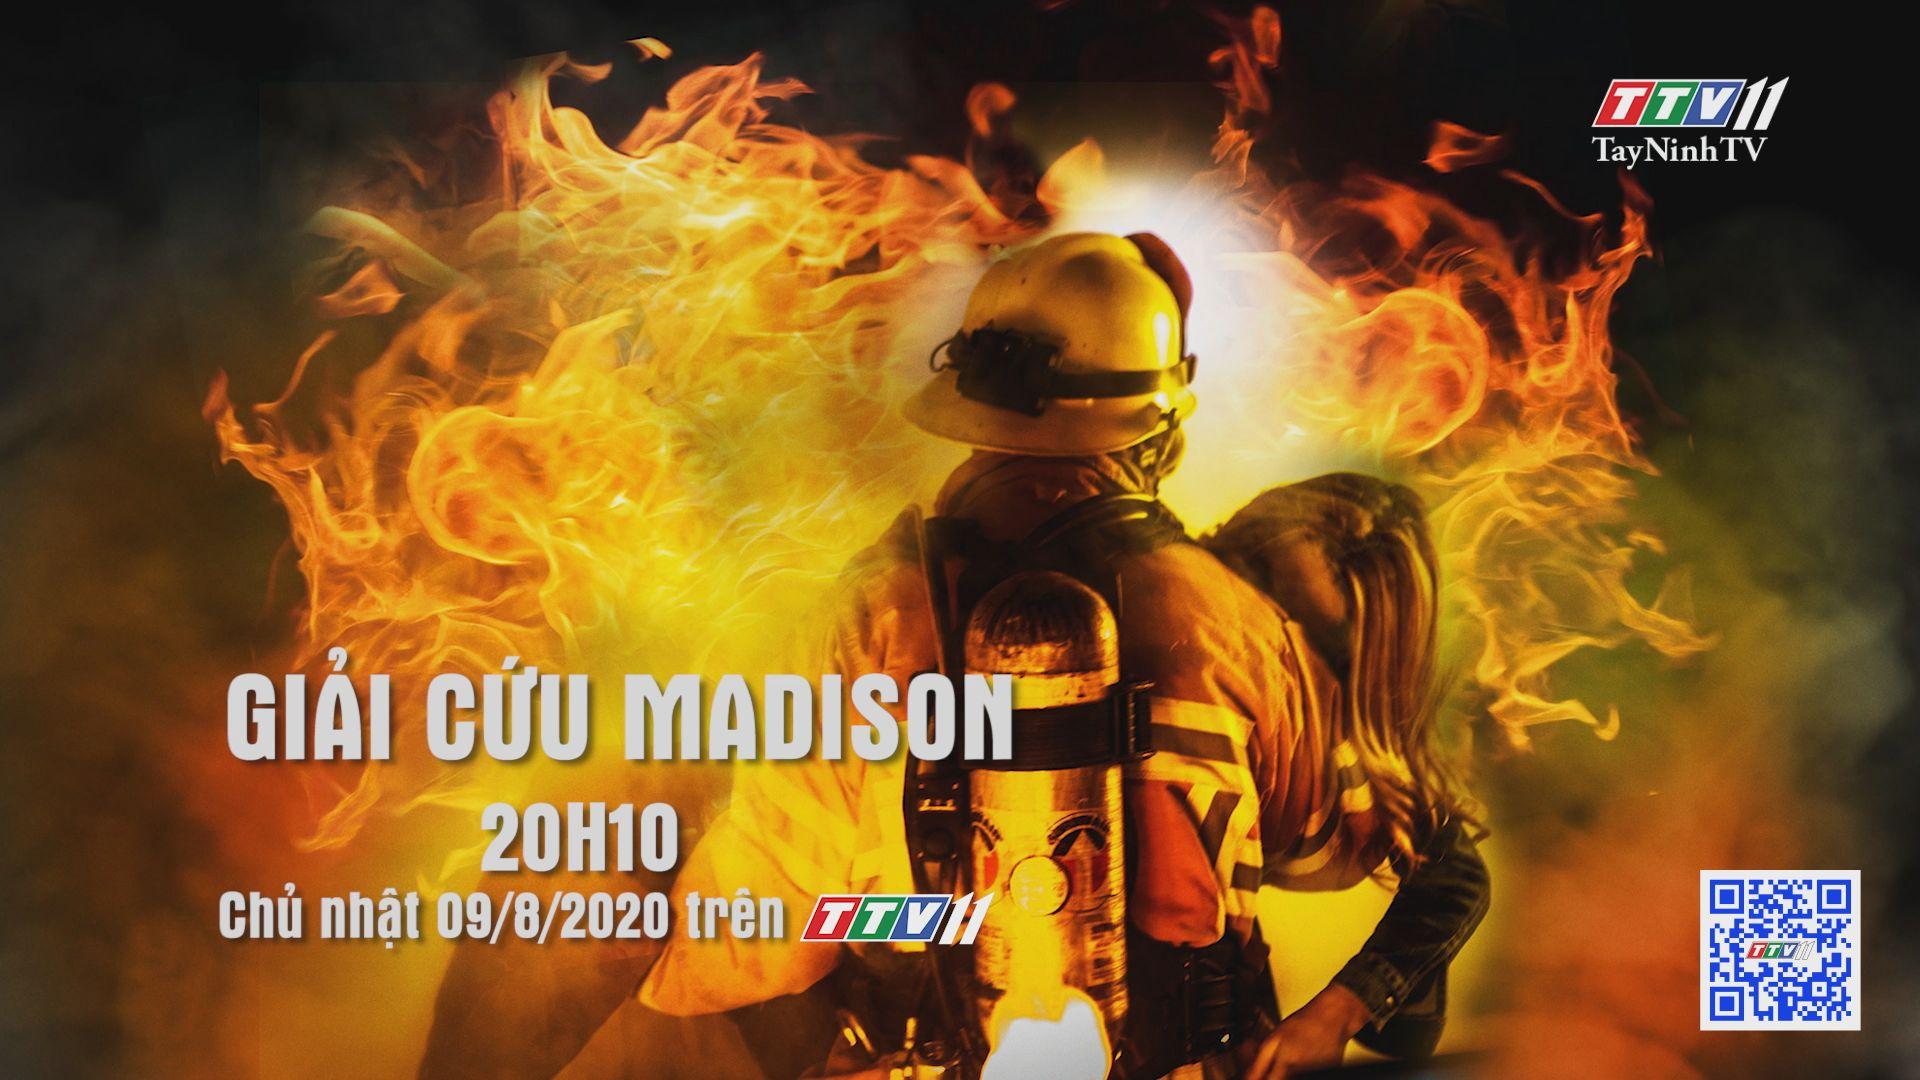 Phim giải cứu Madison | Phim cuối tuần | TayNinhTV